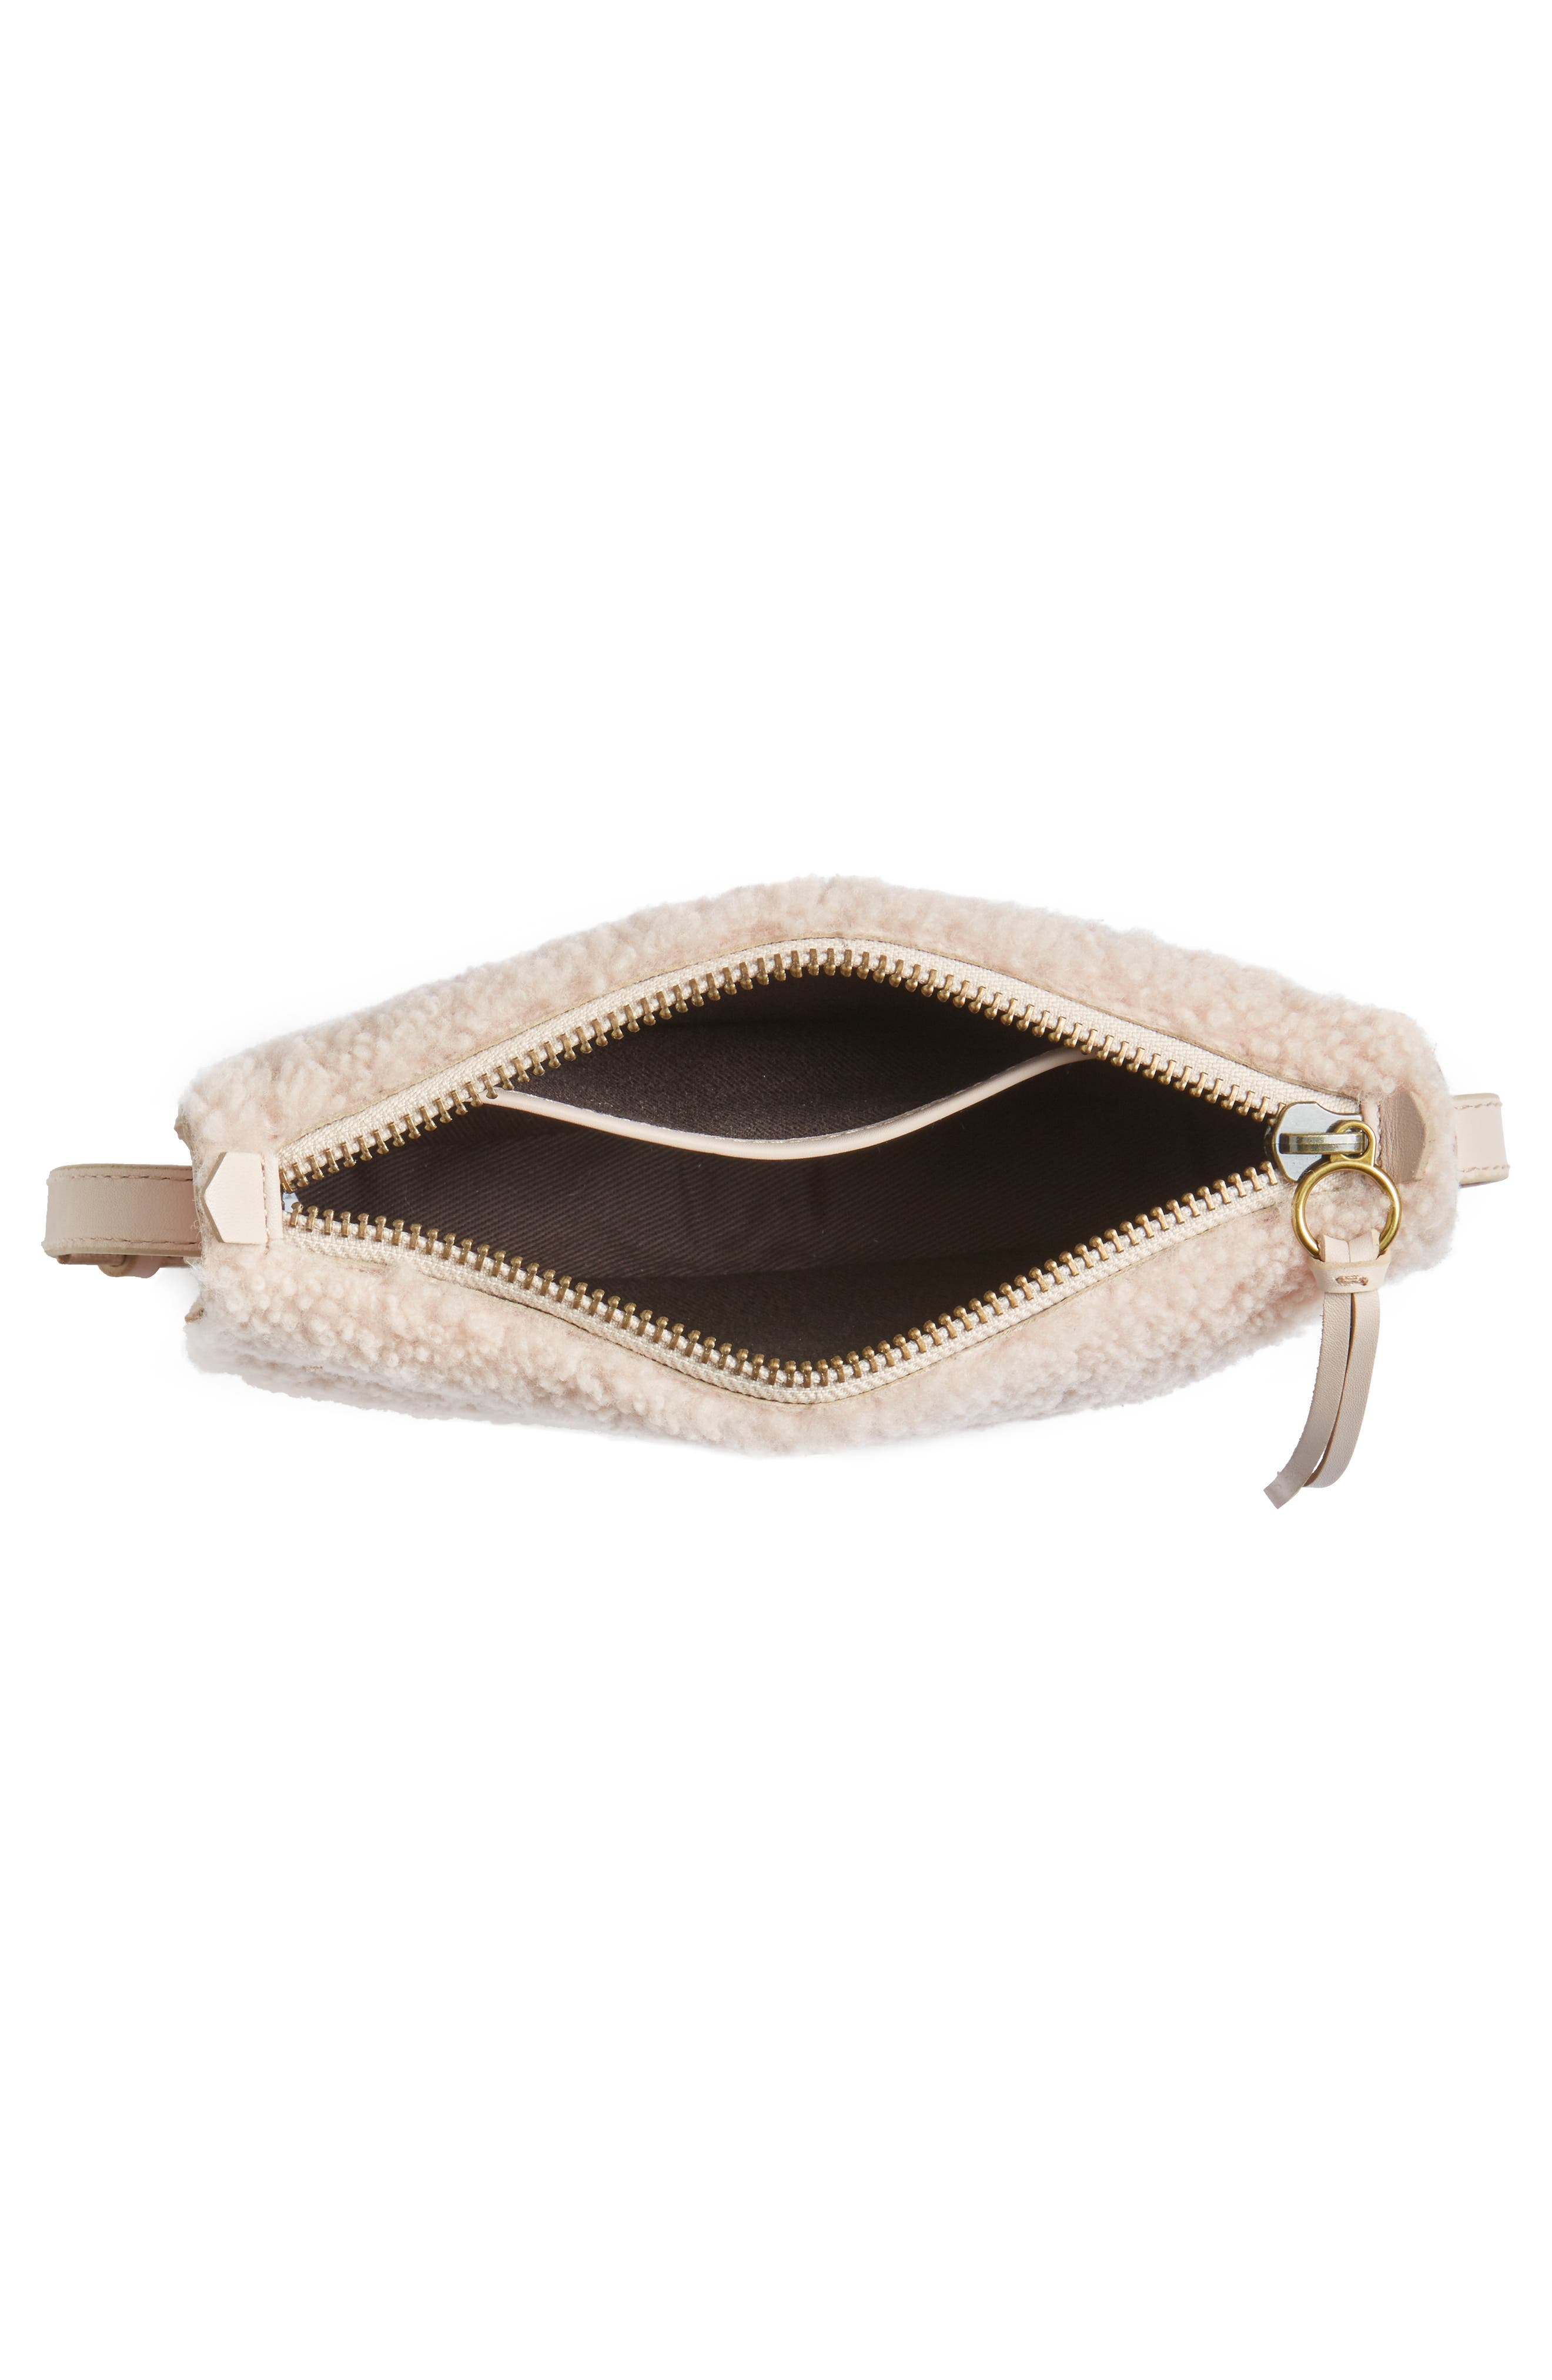 Simple Genuine Shearling Crossbody Bag,                             Alternate thumbnail 4, color,                             655